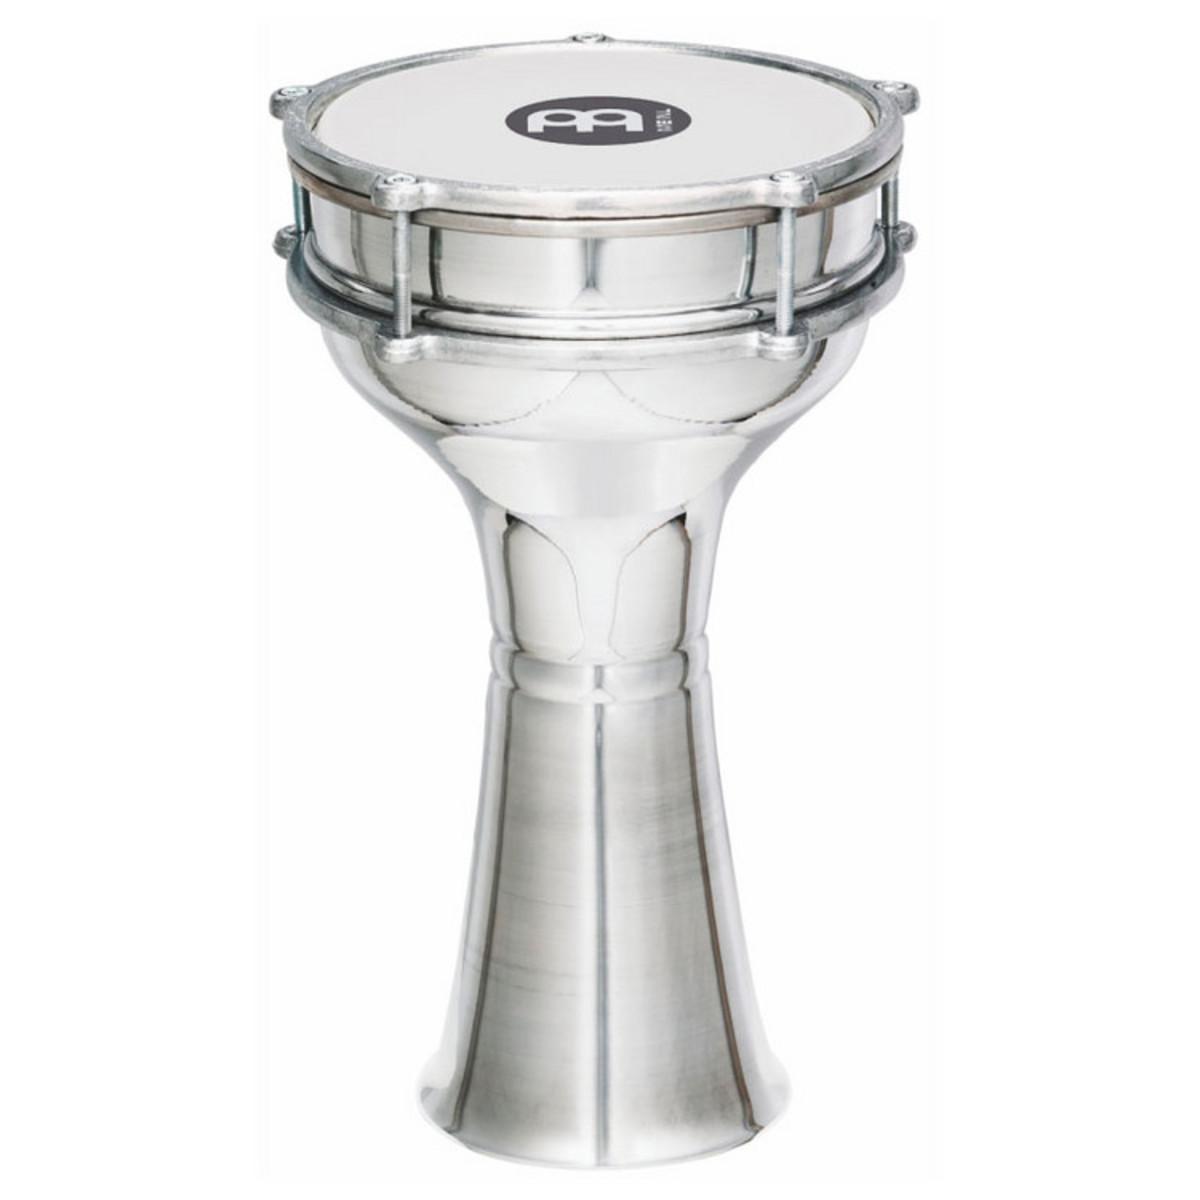 Meinl Percussion Darbuka HE103